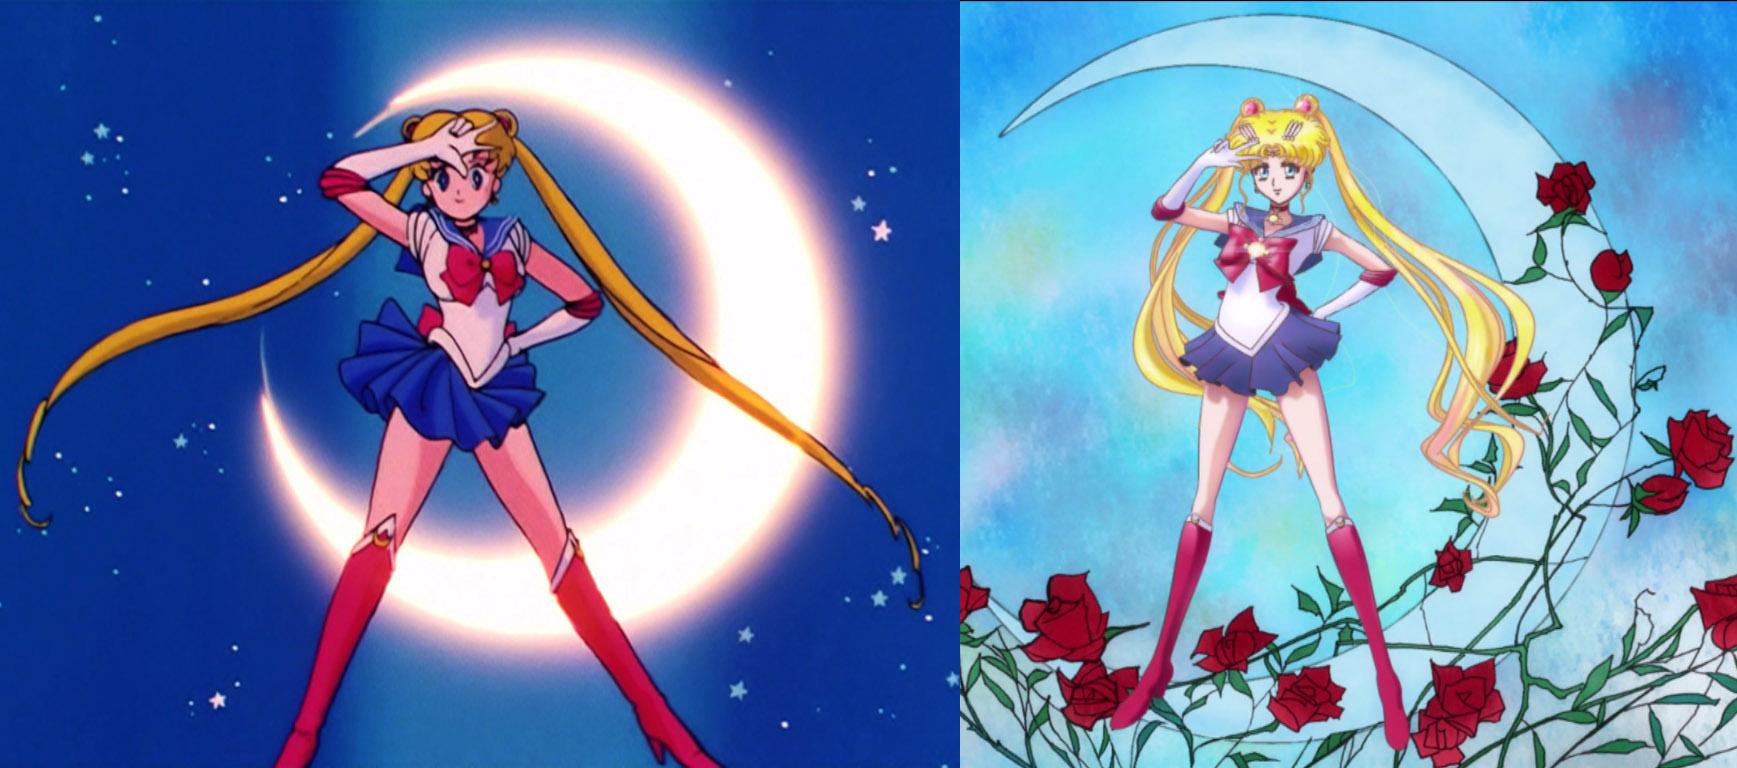 Sailor moon bs